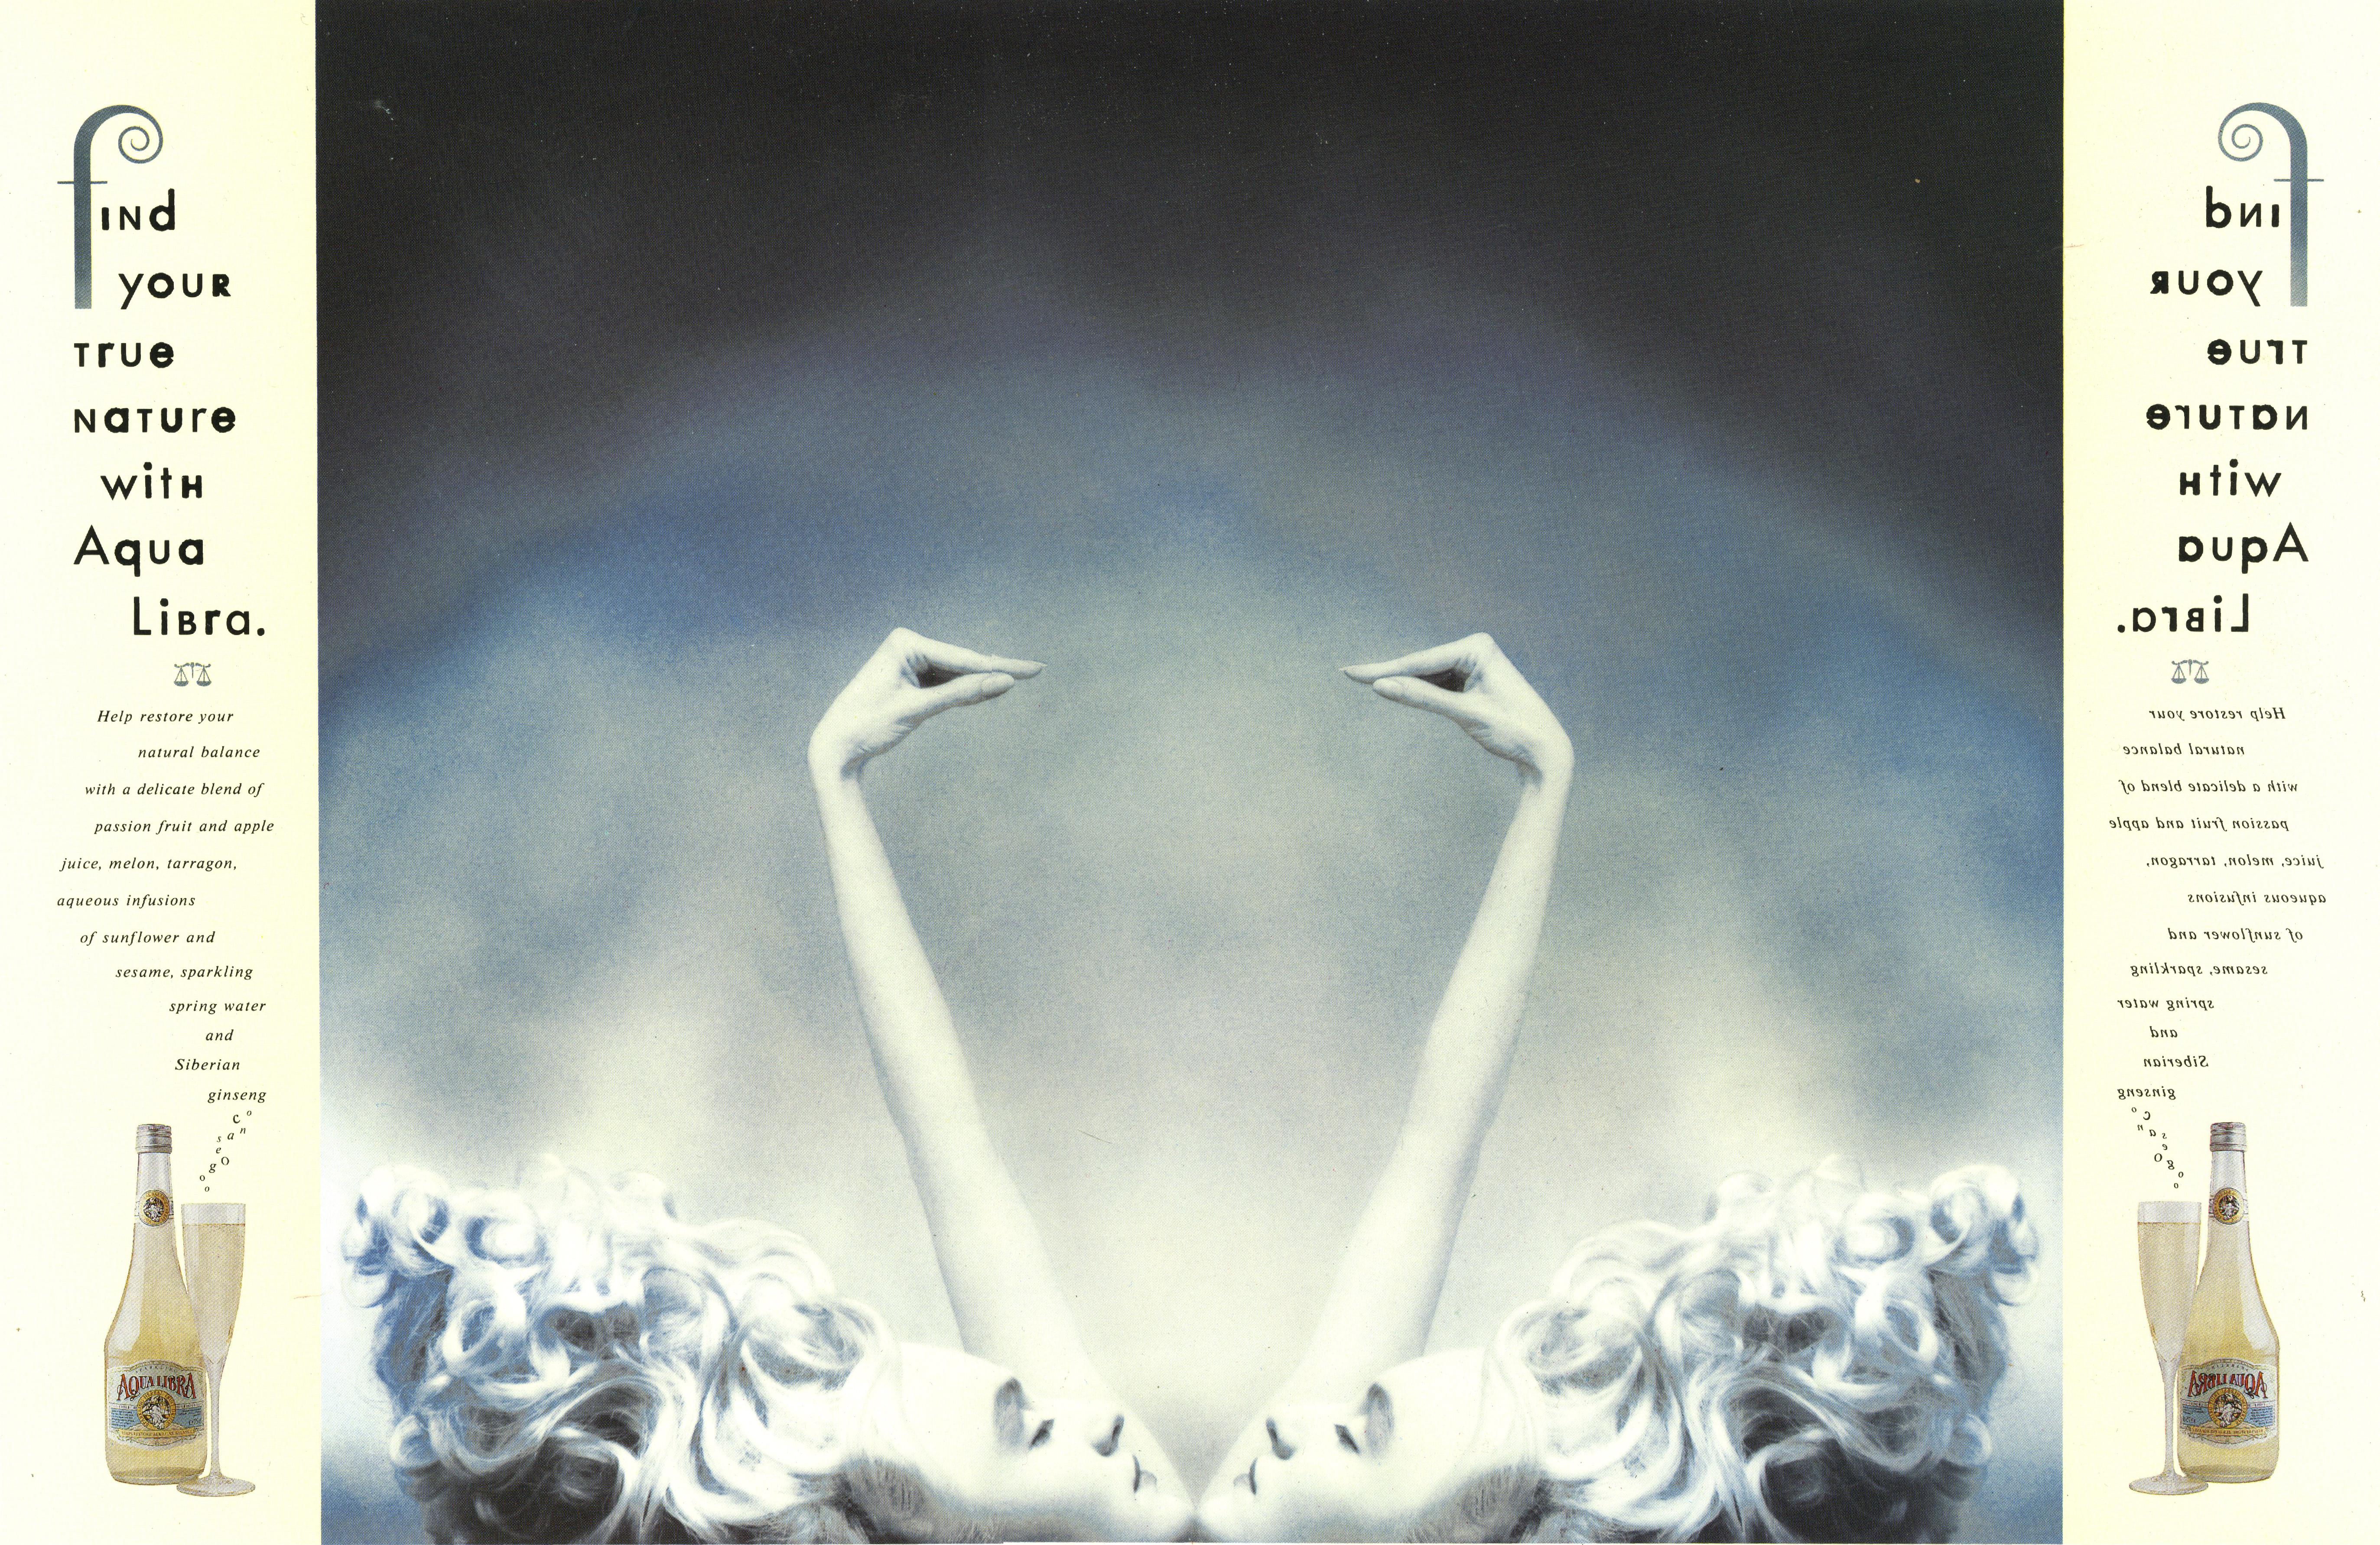 'Hands' Aqua Libra, Mark Reddy, Ayer-01.jpg